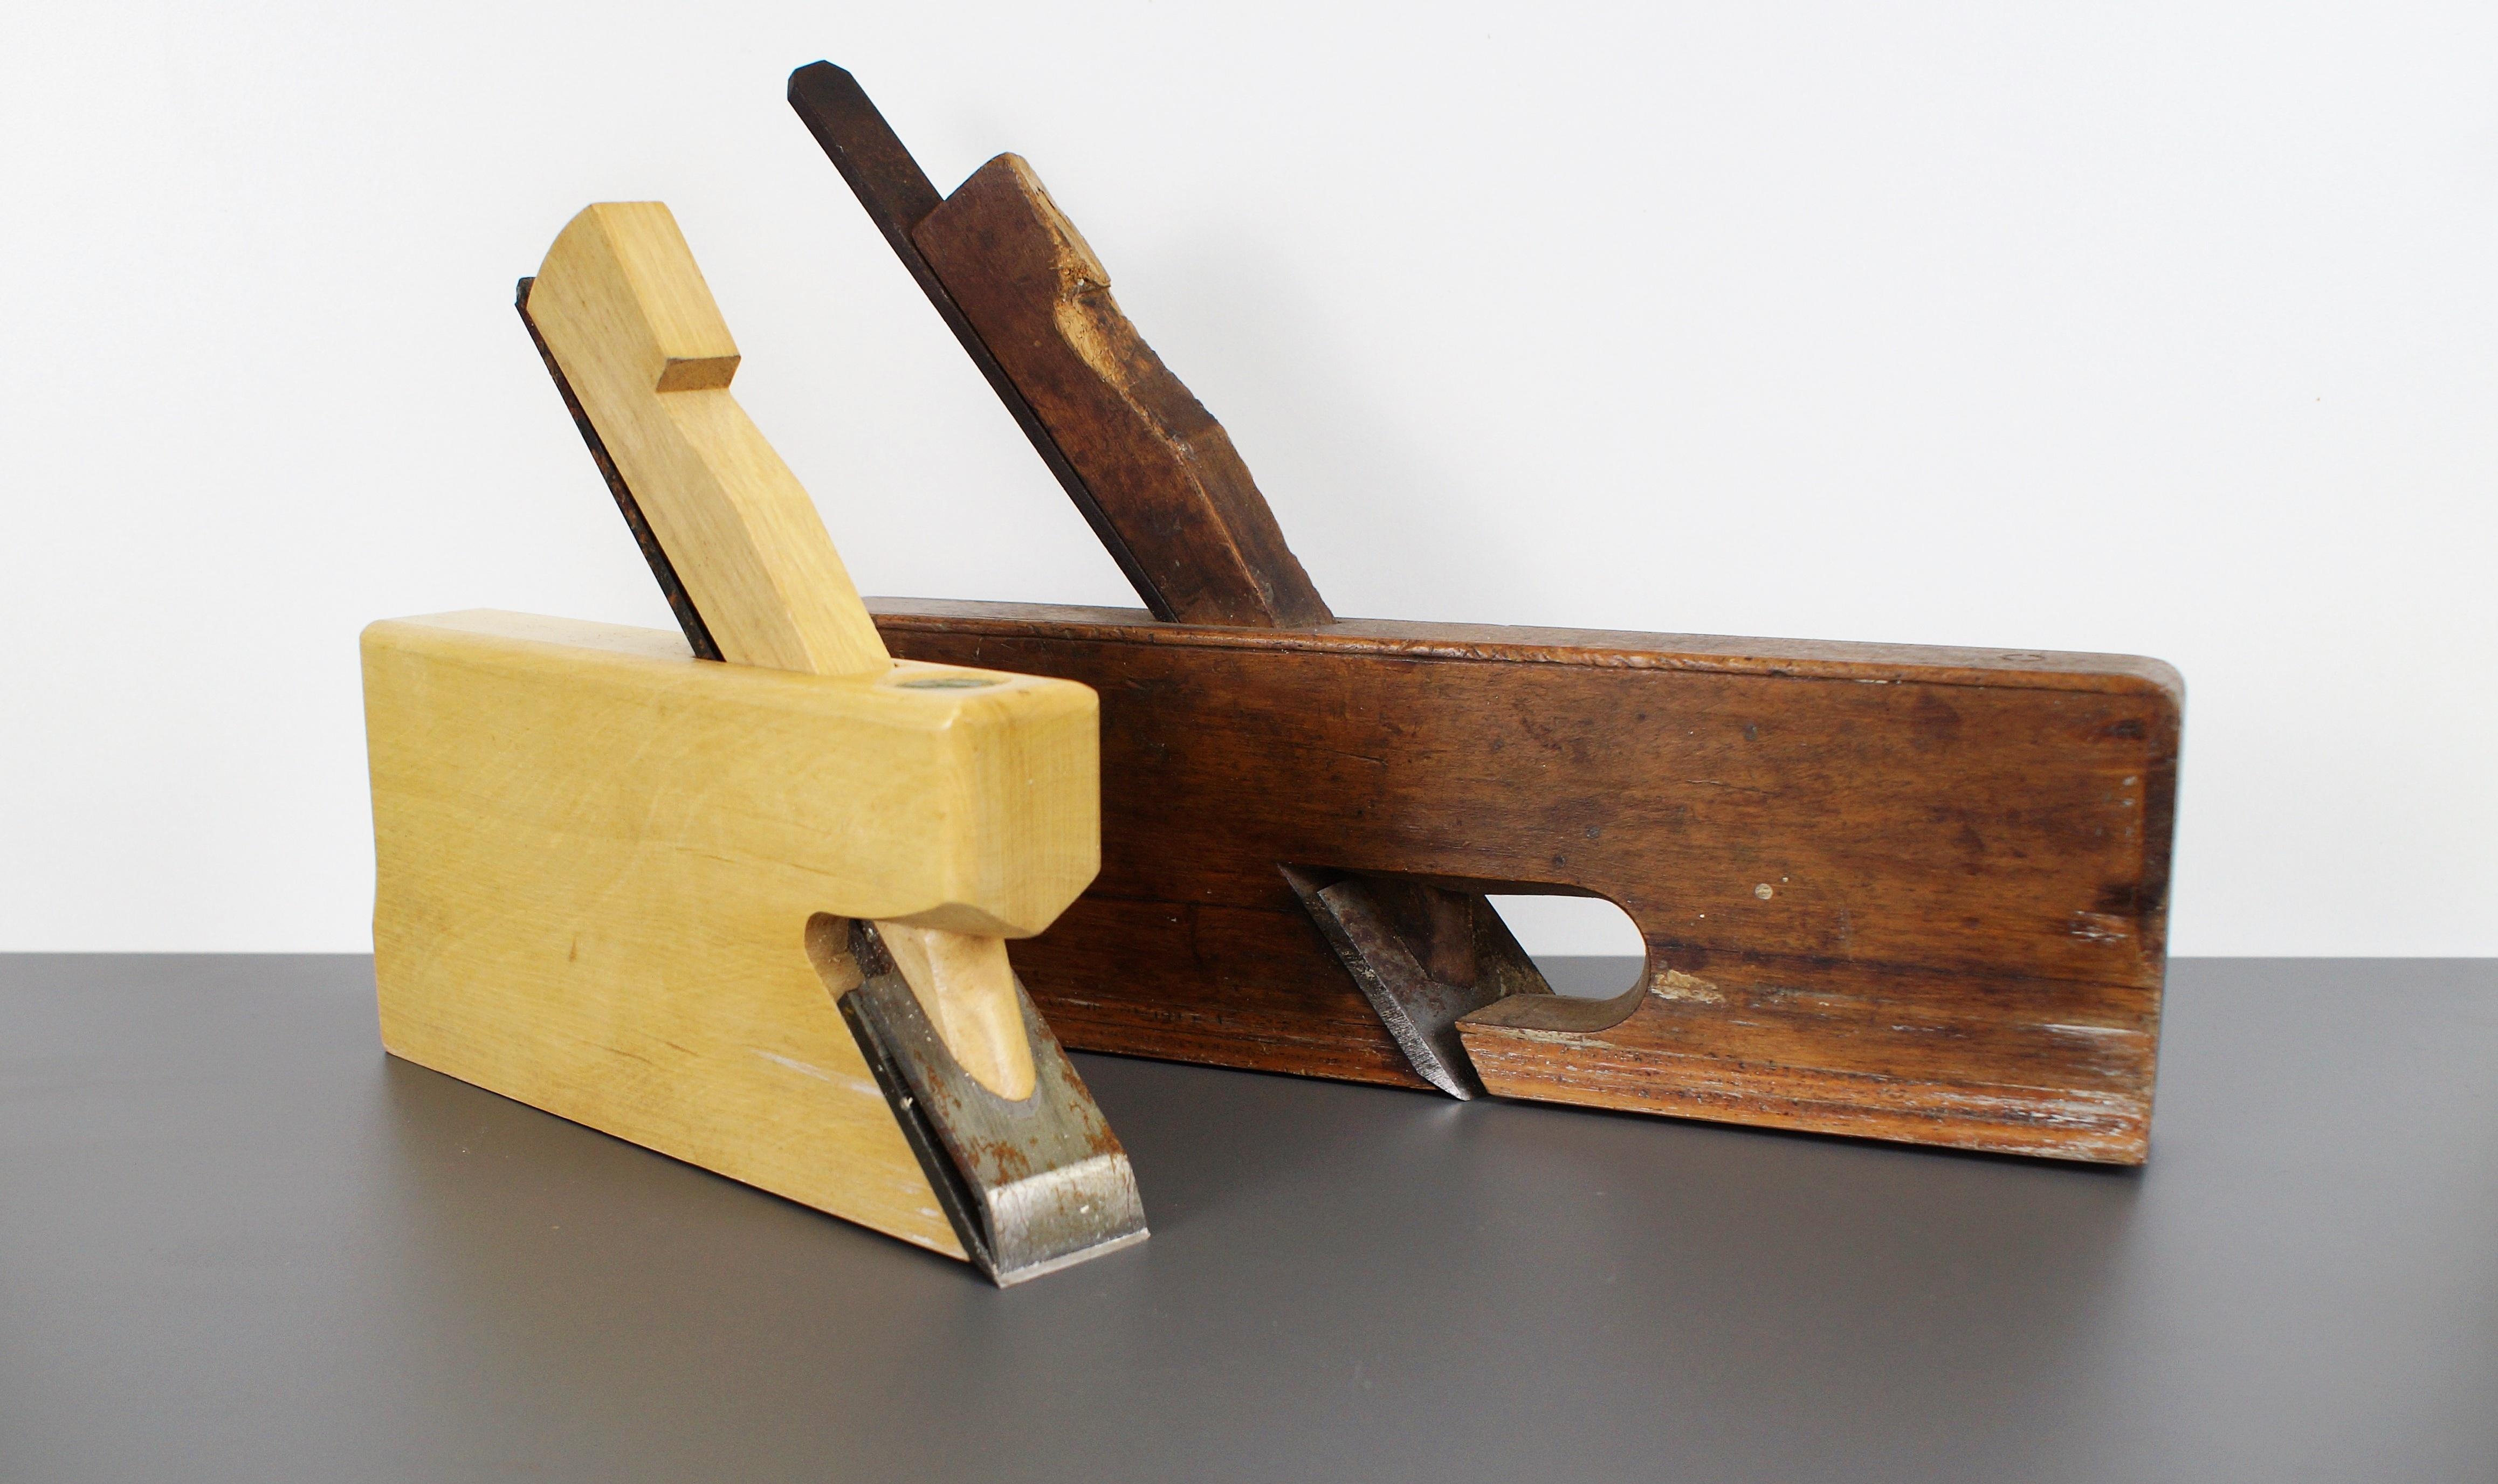 Free tool craft room wood work product carpenter